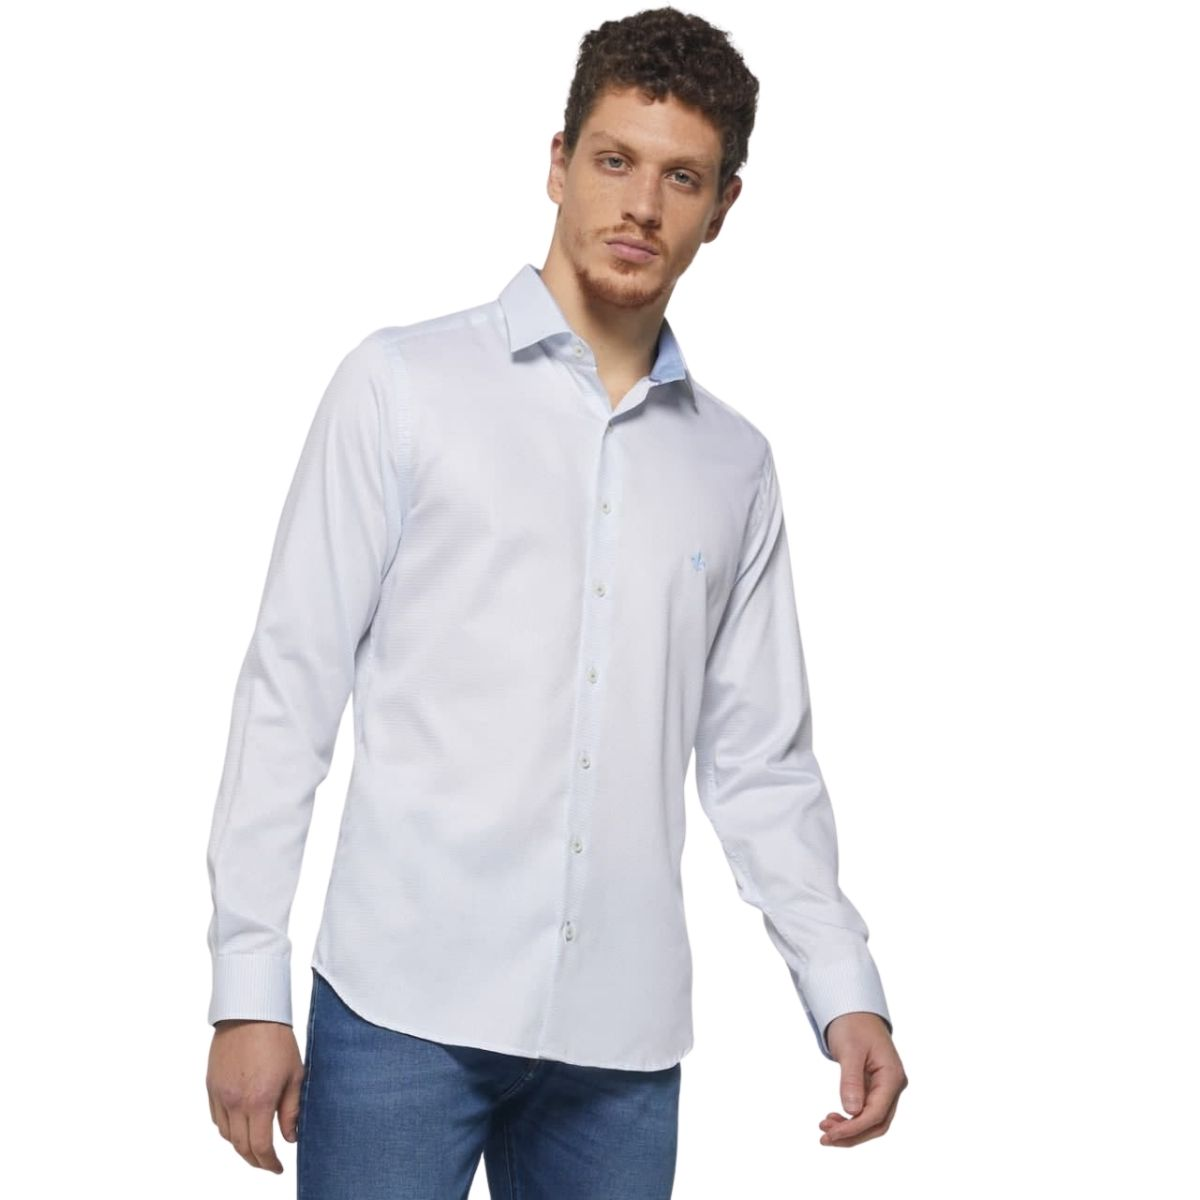 Camisa Dudalina Manga Longa Maquinetada Comfort Home e Office